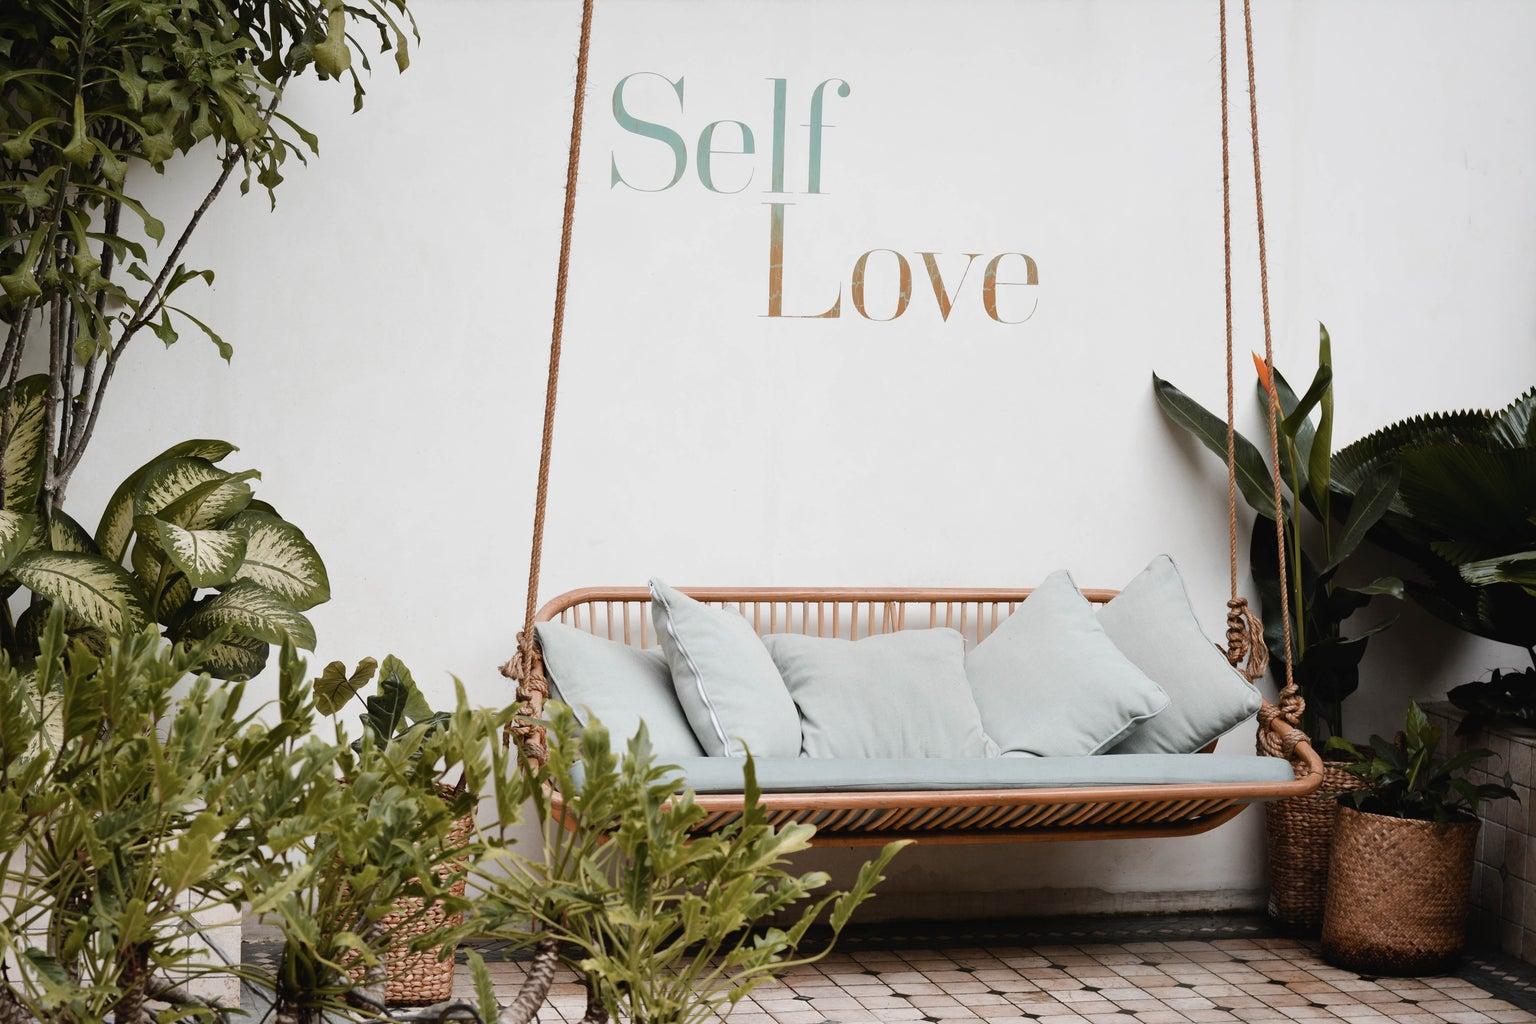 self-love and swing